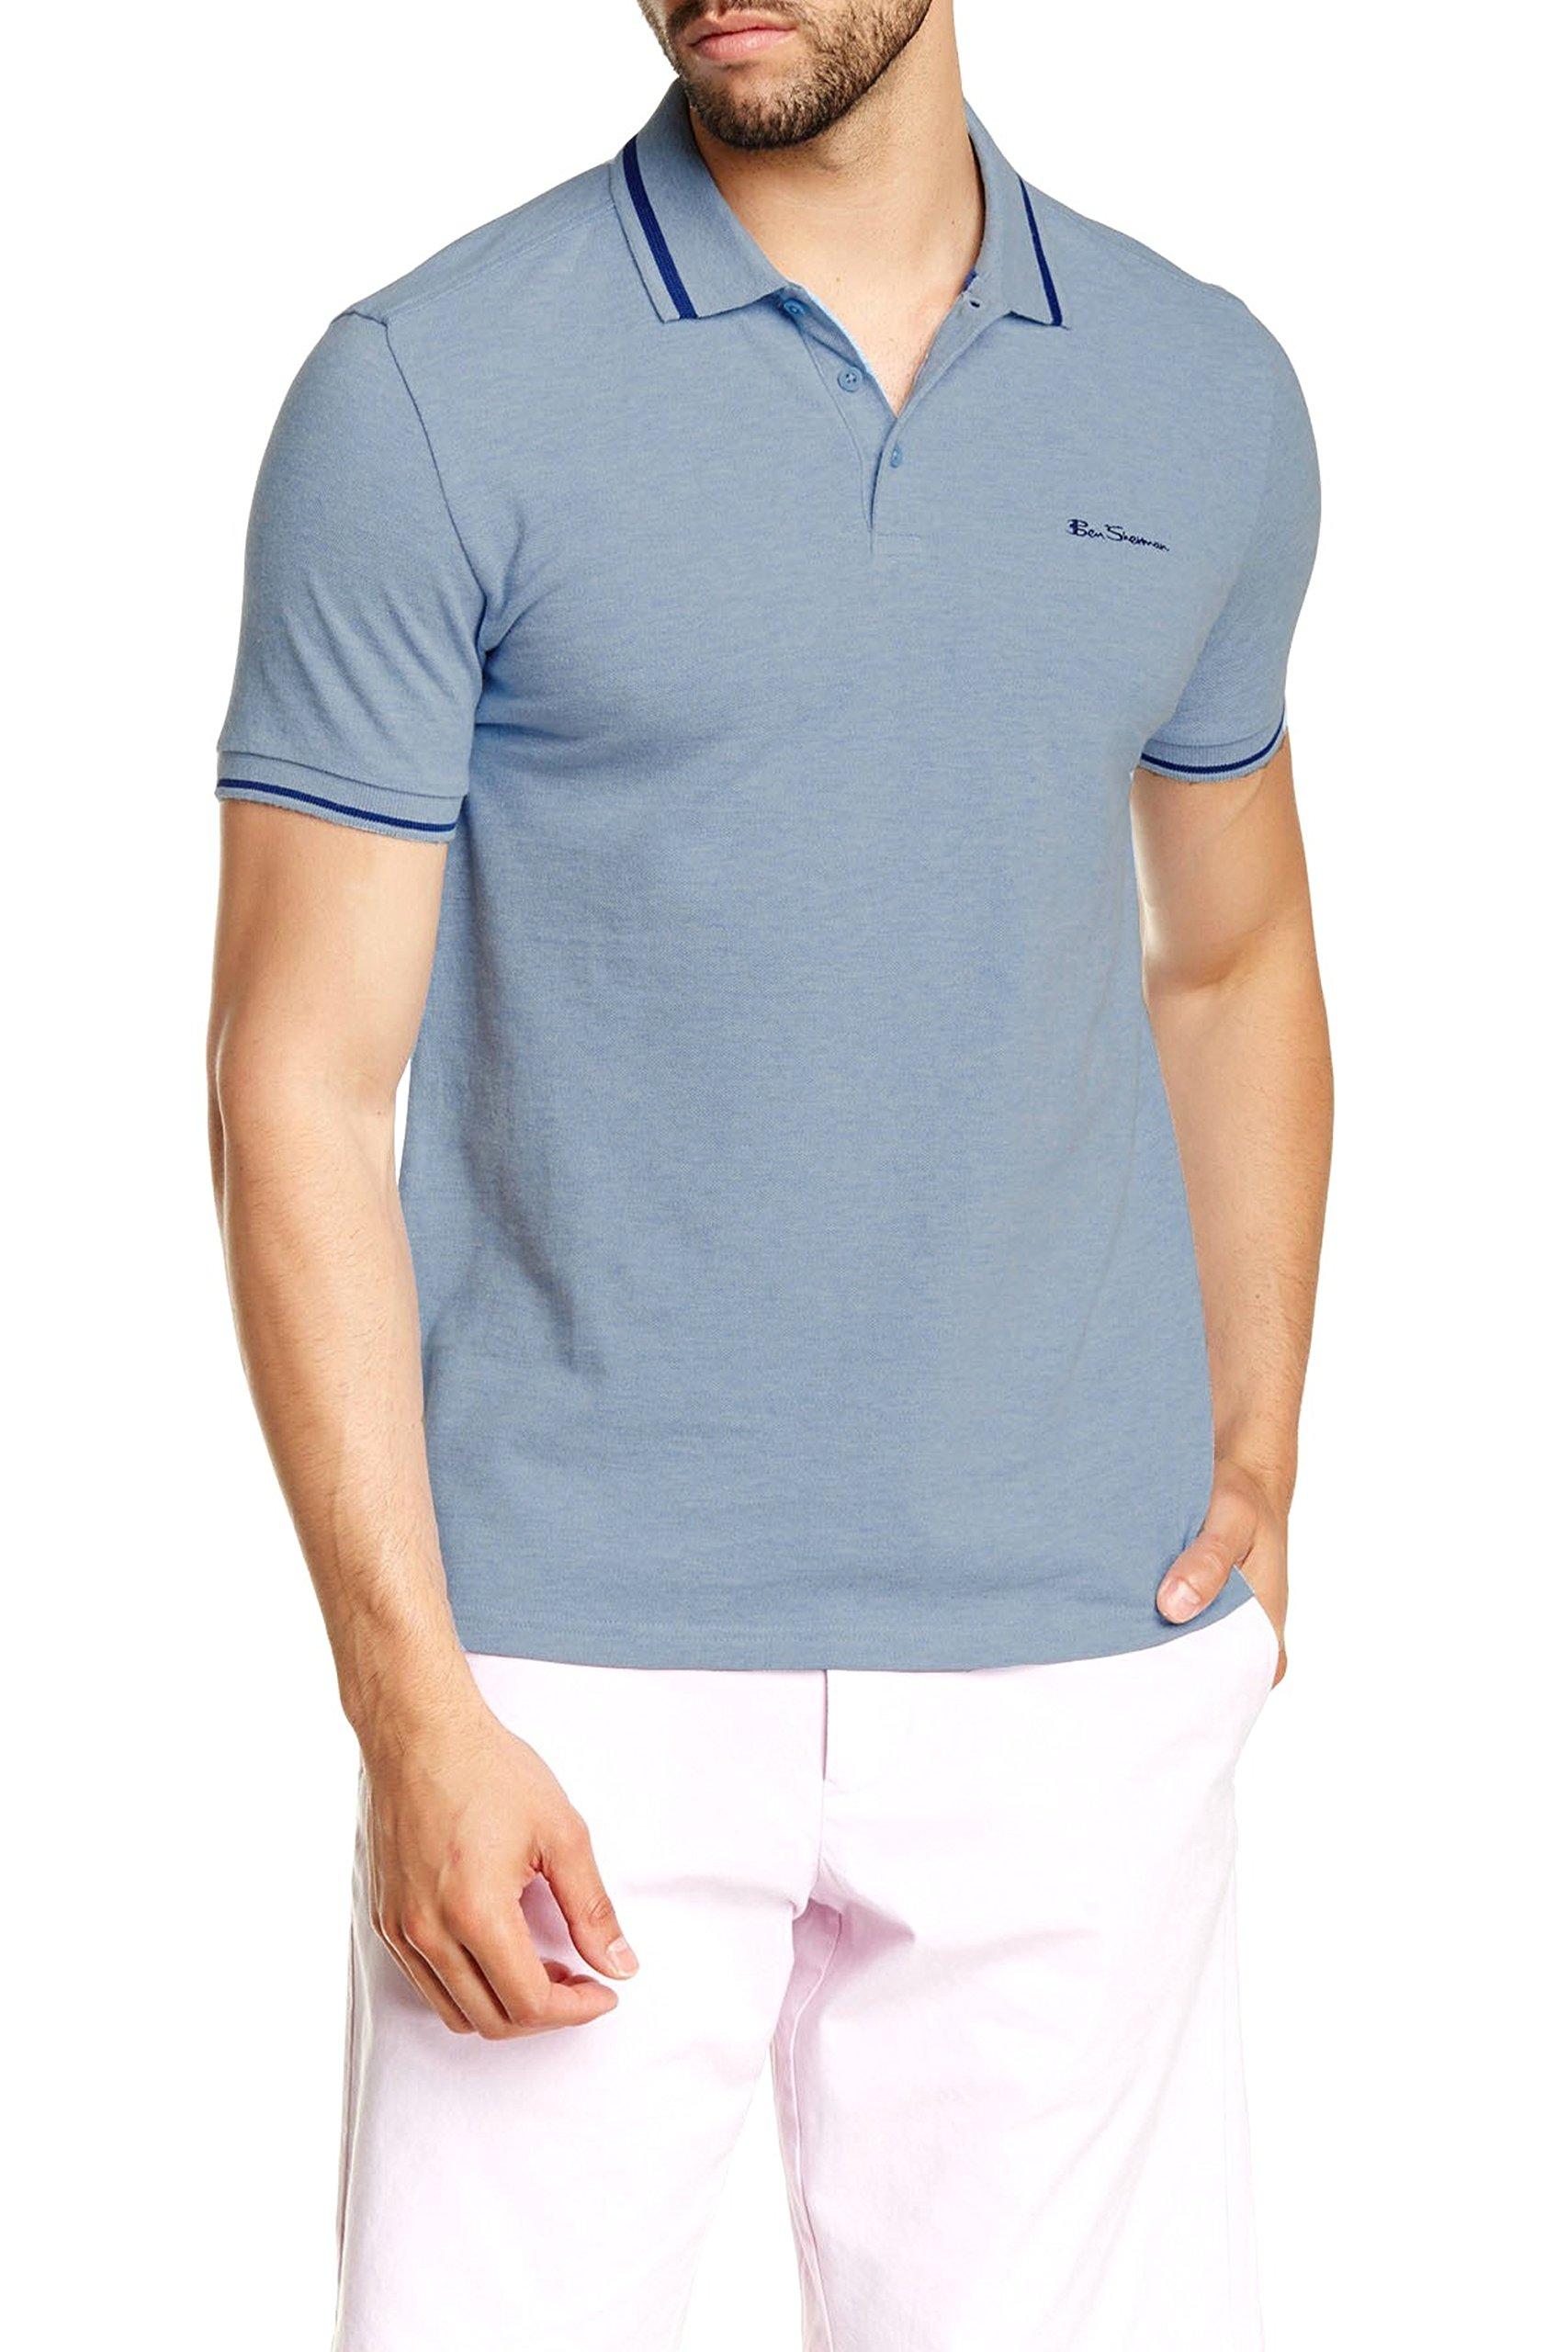 Ben Sherman Mens Contrast Tipped Pique Polo Shirt (Large, Sky Blue Marl)